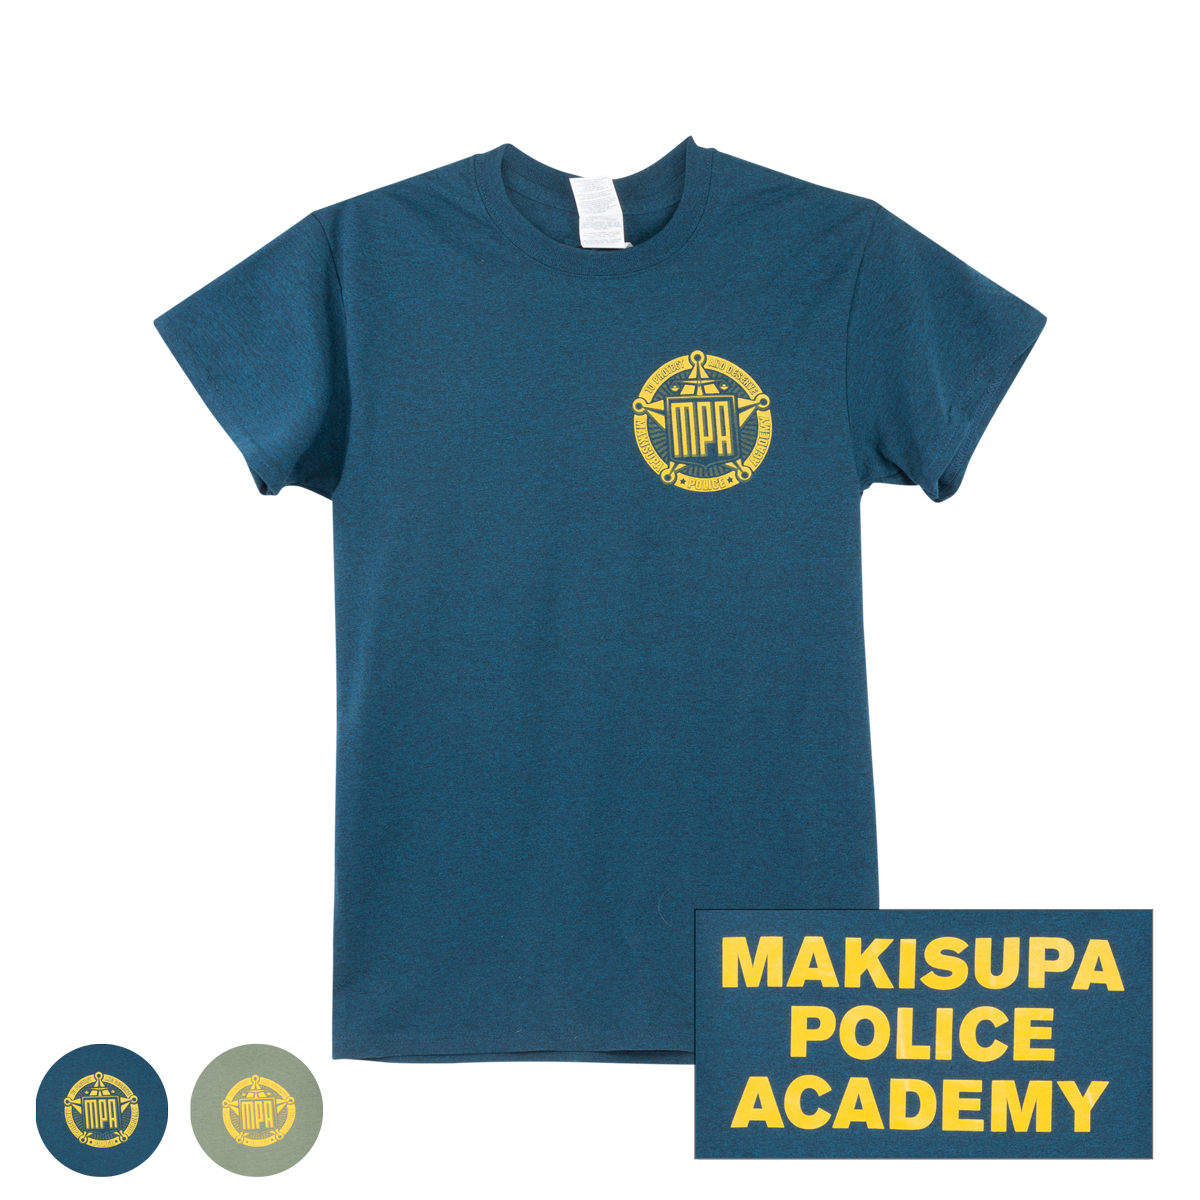 Makisupa Police Academy T-shirt